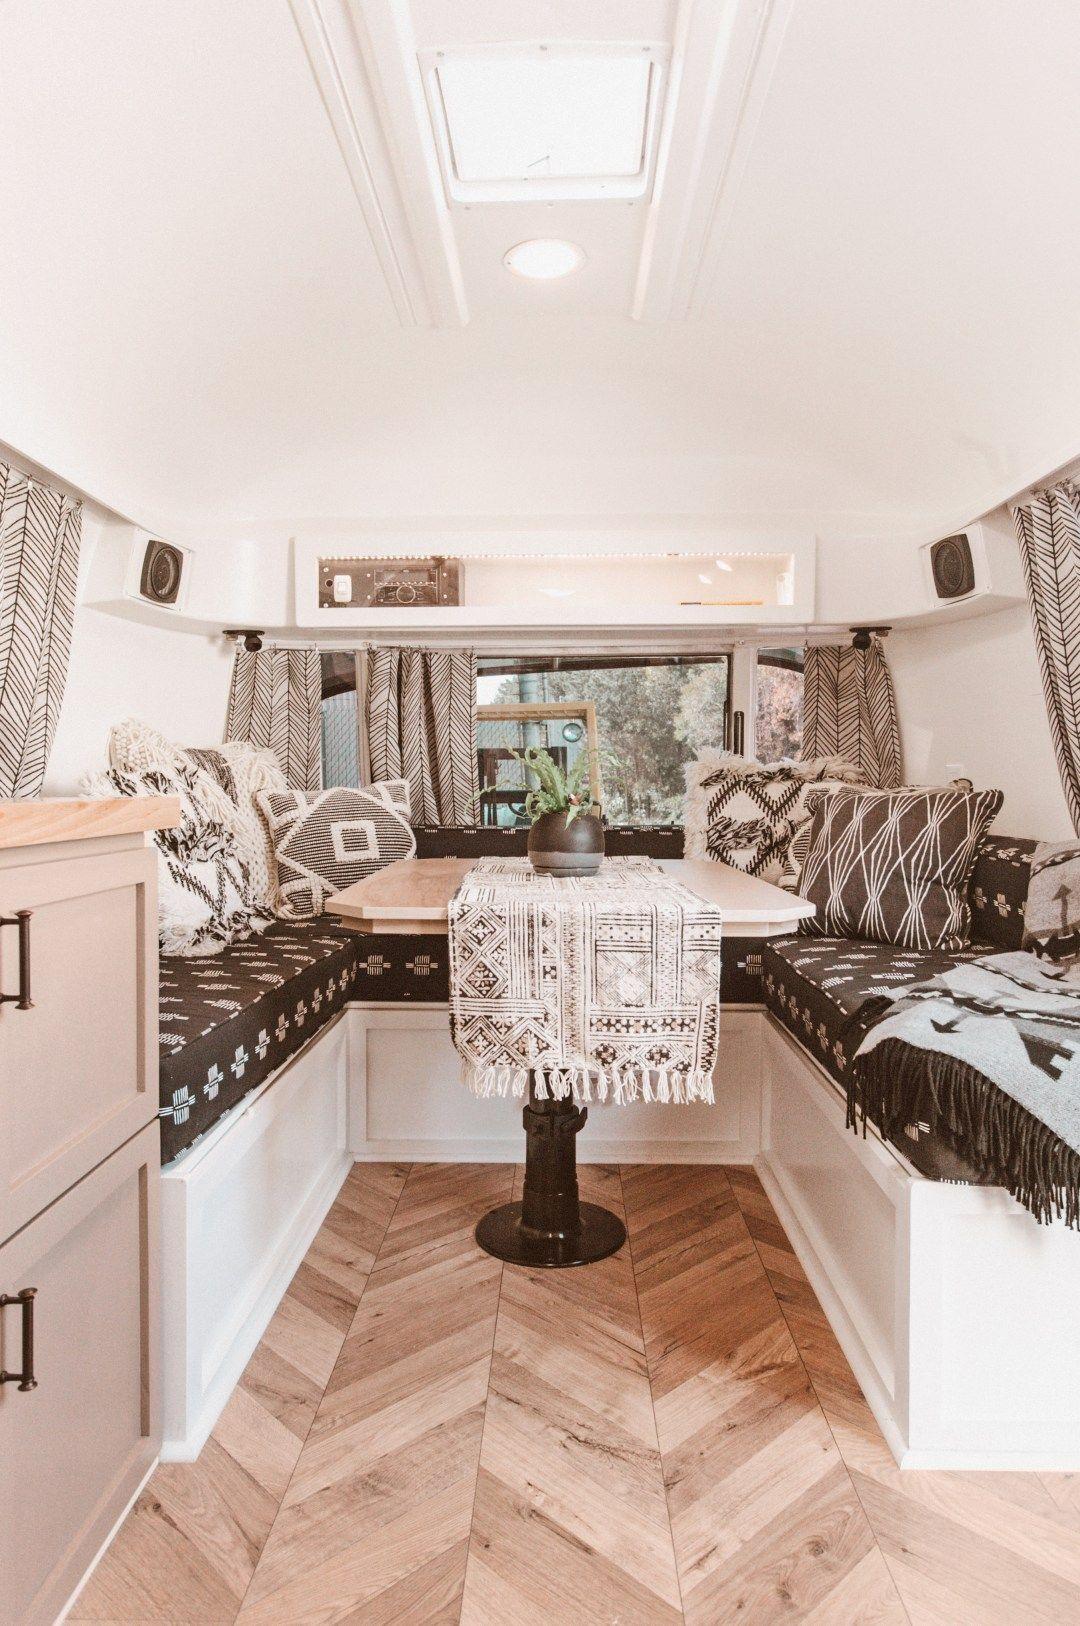 Thelma Project Caravane Van Amenage Airstream